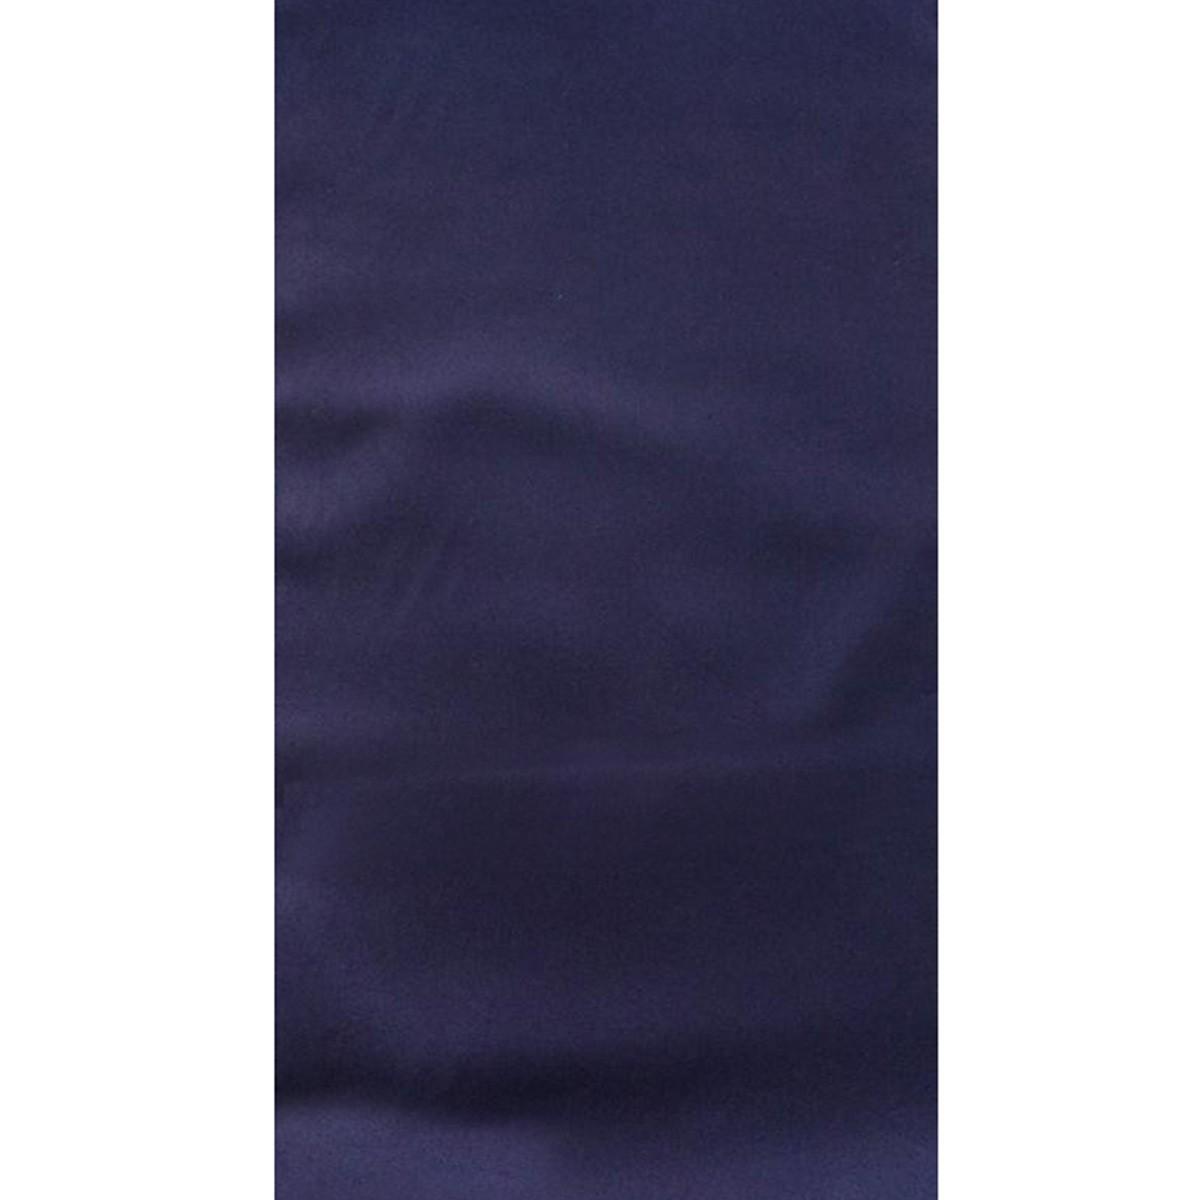 Stoffa Per Sedie A Sdraio.Tessuti Per Sdraio In Cotone Tinta Unita